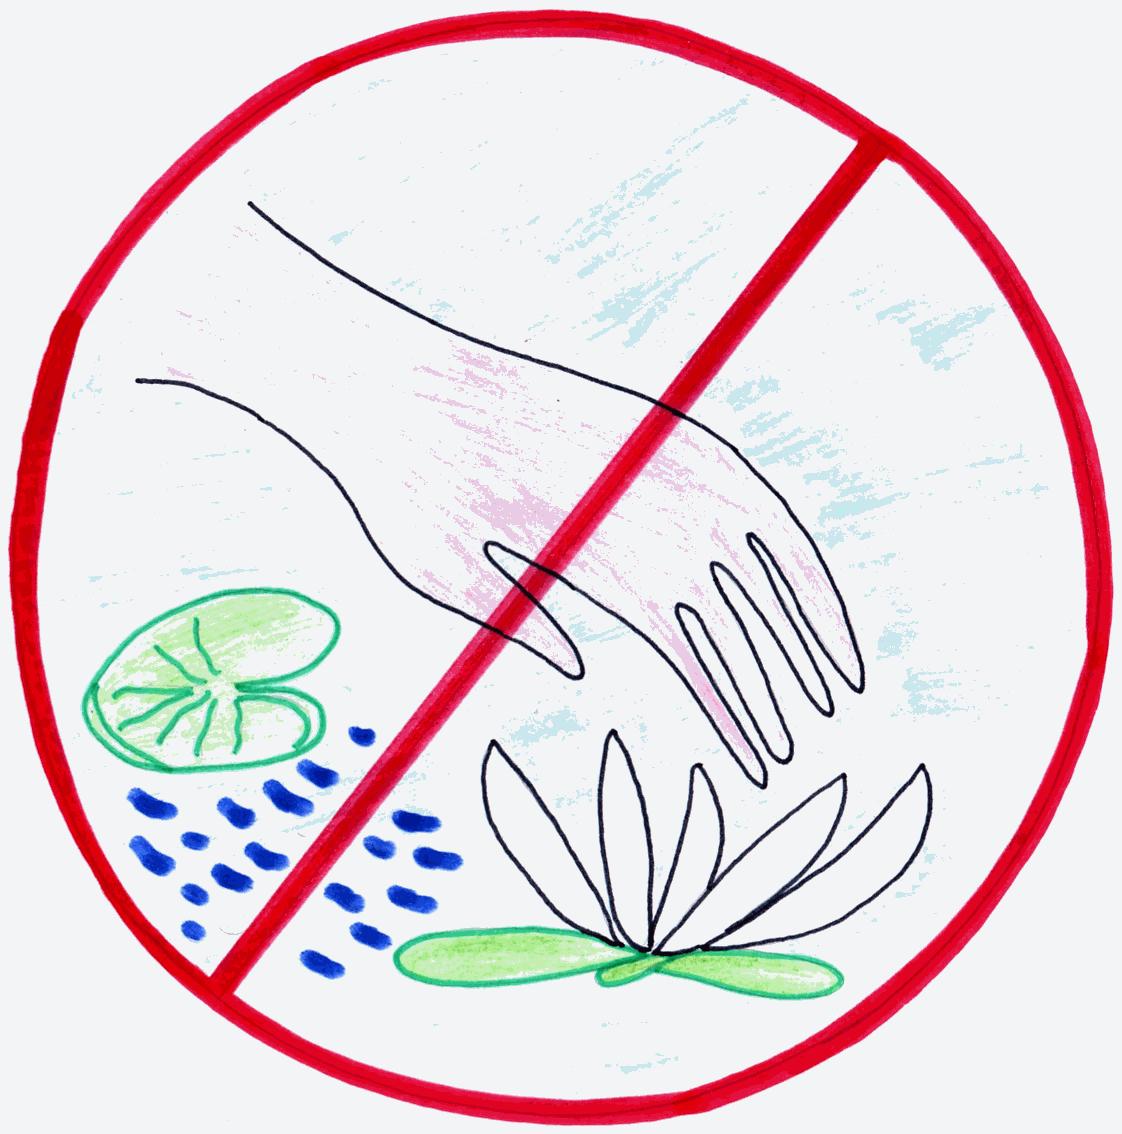 картинки разрешающие знаки по охране воды заходите наш сайт